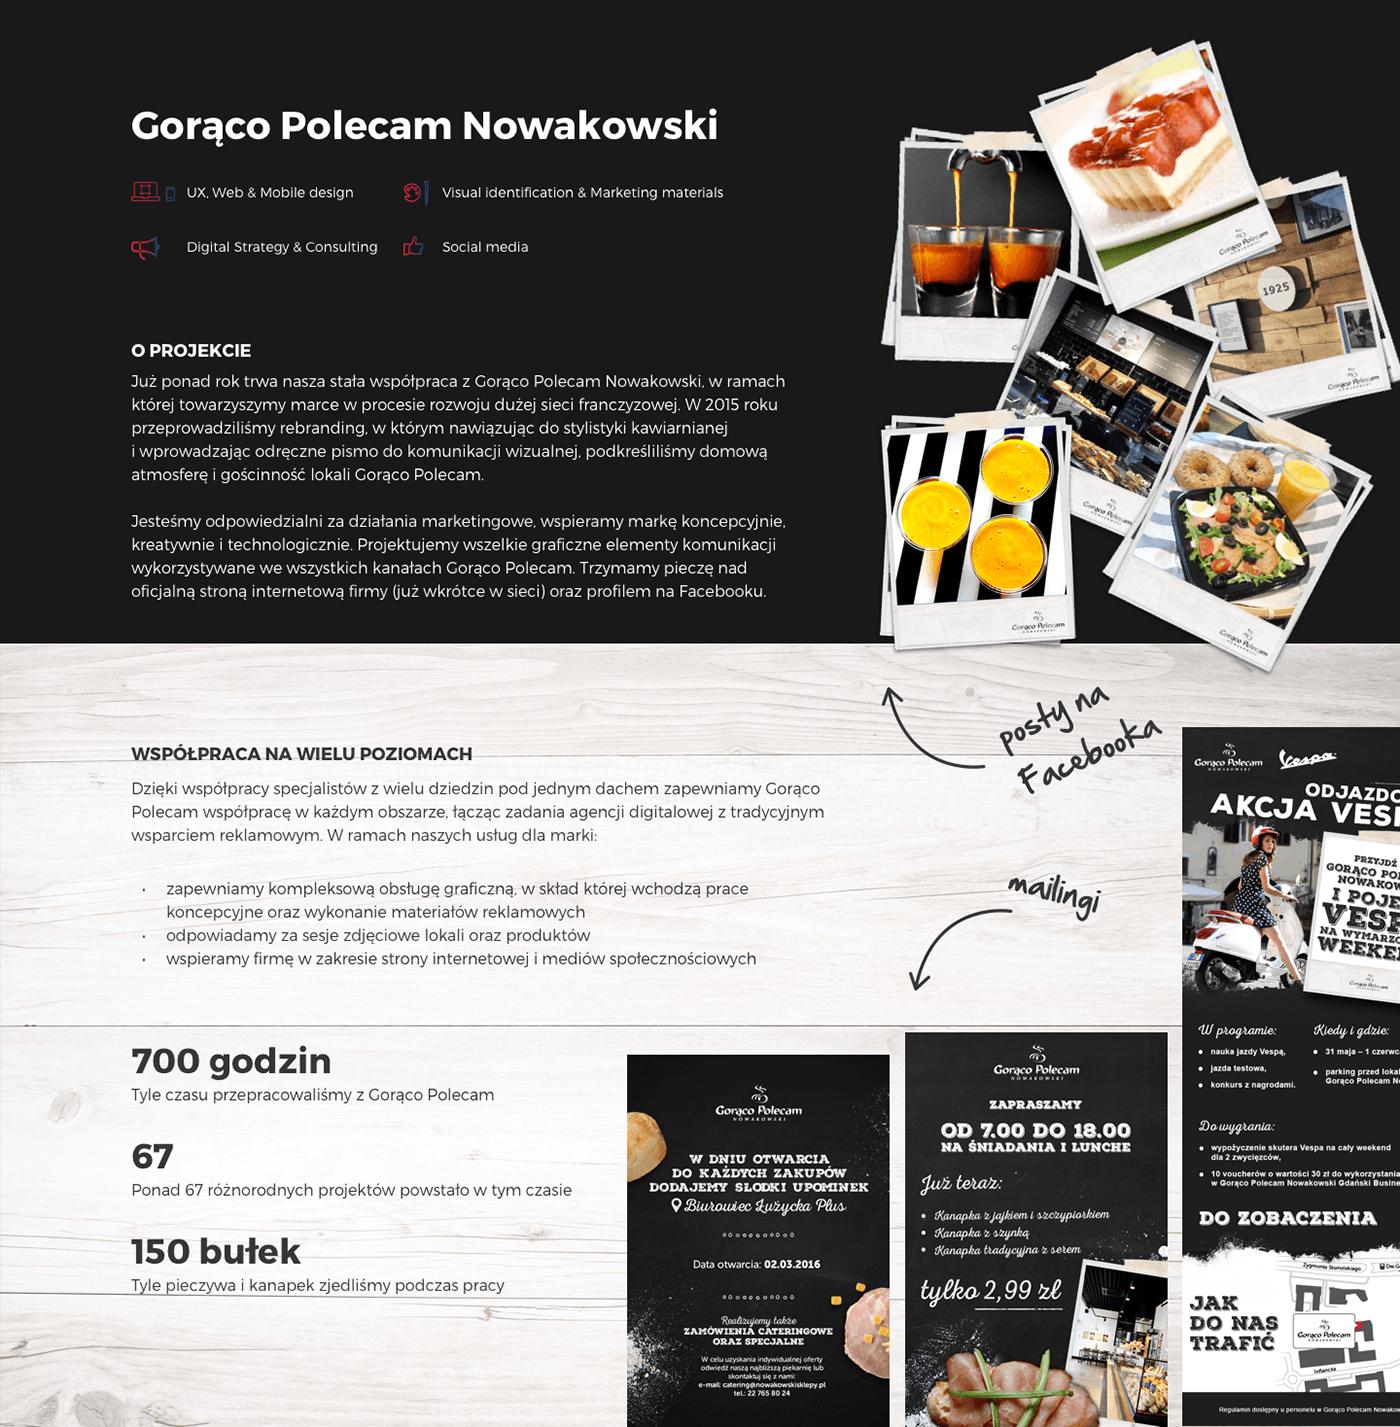 Food ,photo,Coffee,barista,sandwich,Layout,grid,agency,print,bread